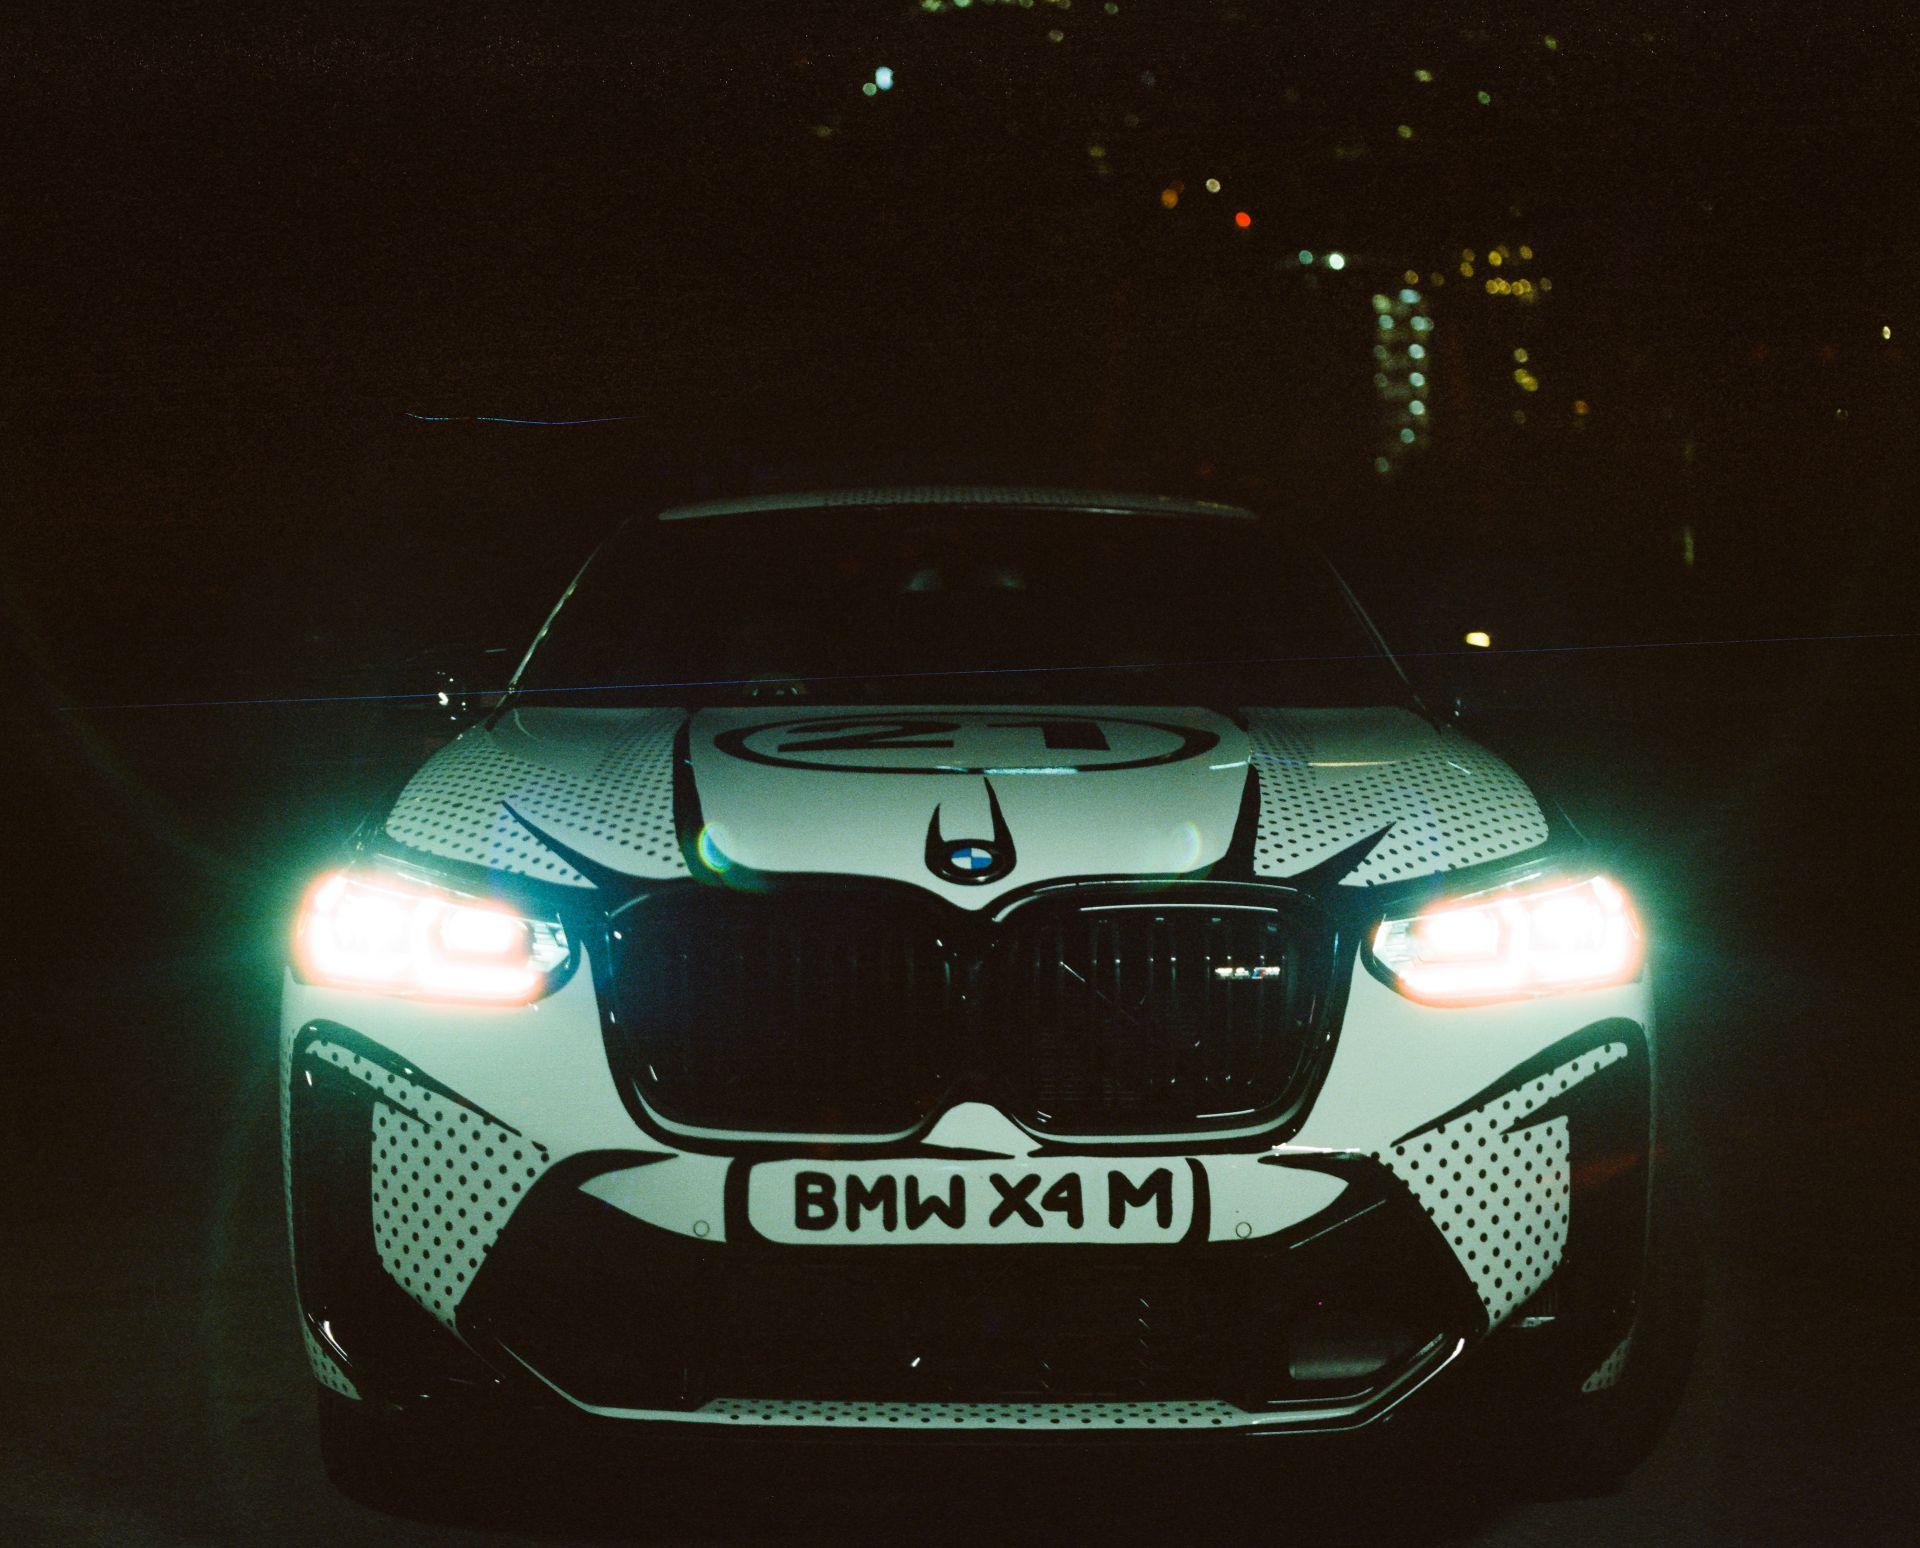 BMW X4 M x Joshua Vides 2